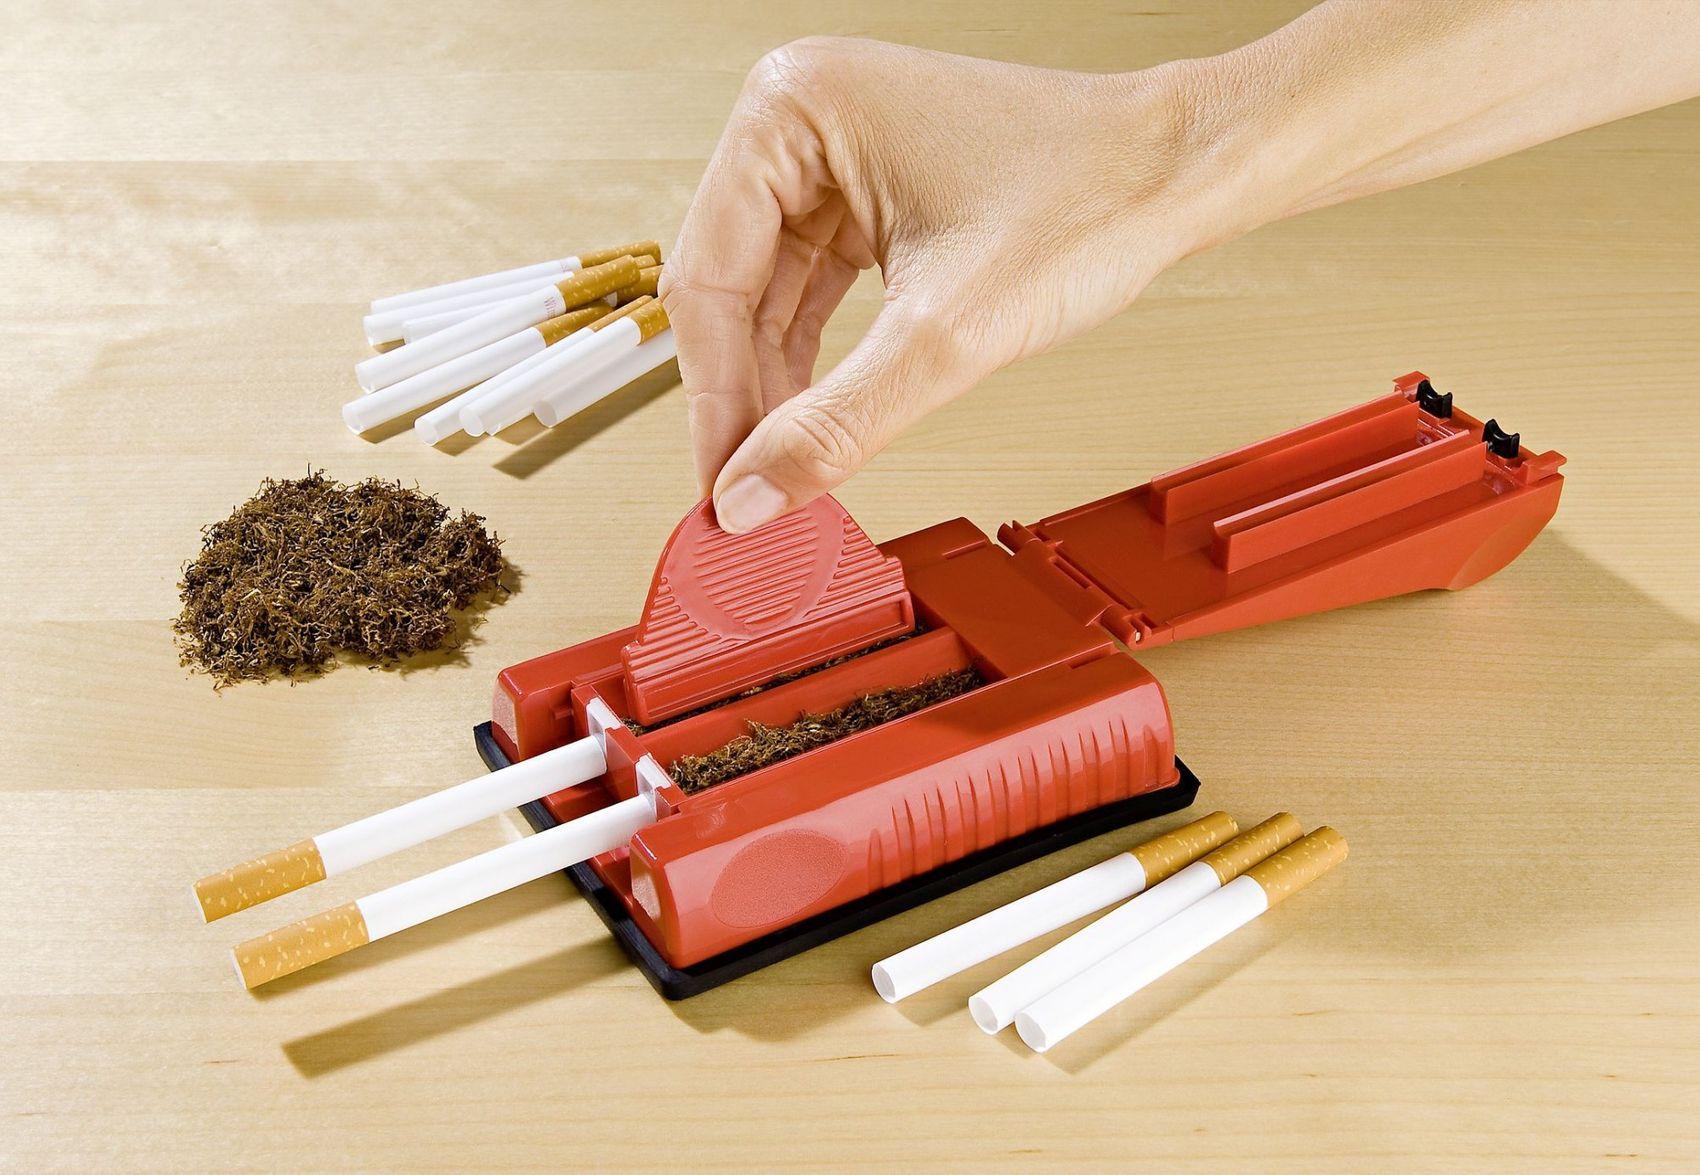 zigaretten stopfmaschine zigarettenstopfer tabak stopfmaschine zum selbst drehen feinschmecker. Black Bedroom Furniture Sets. Home Design Ideas